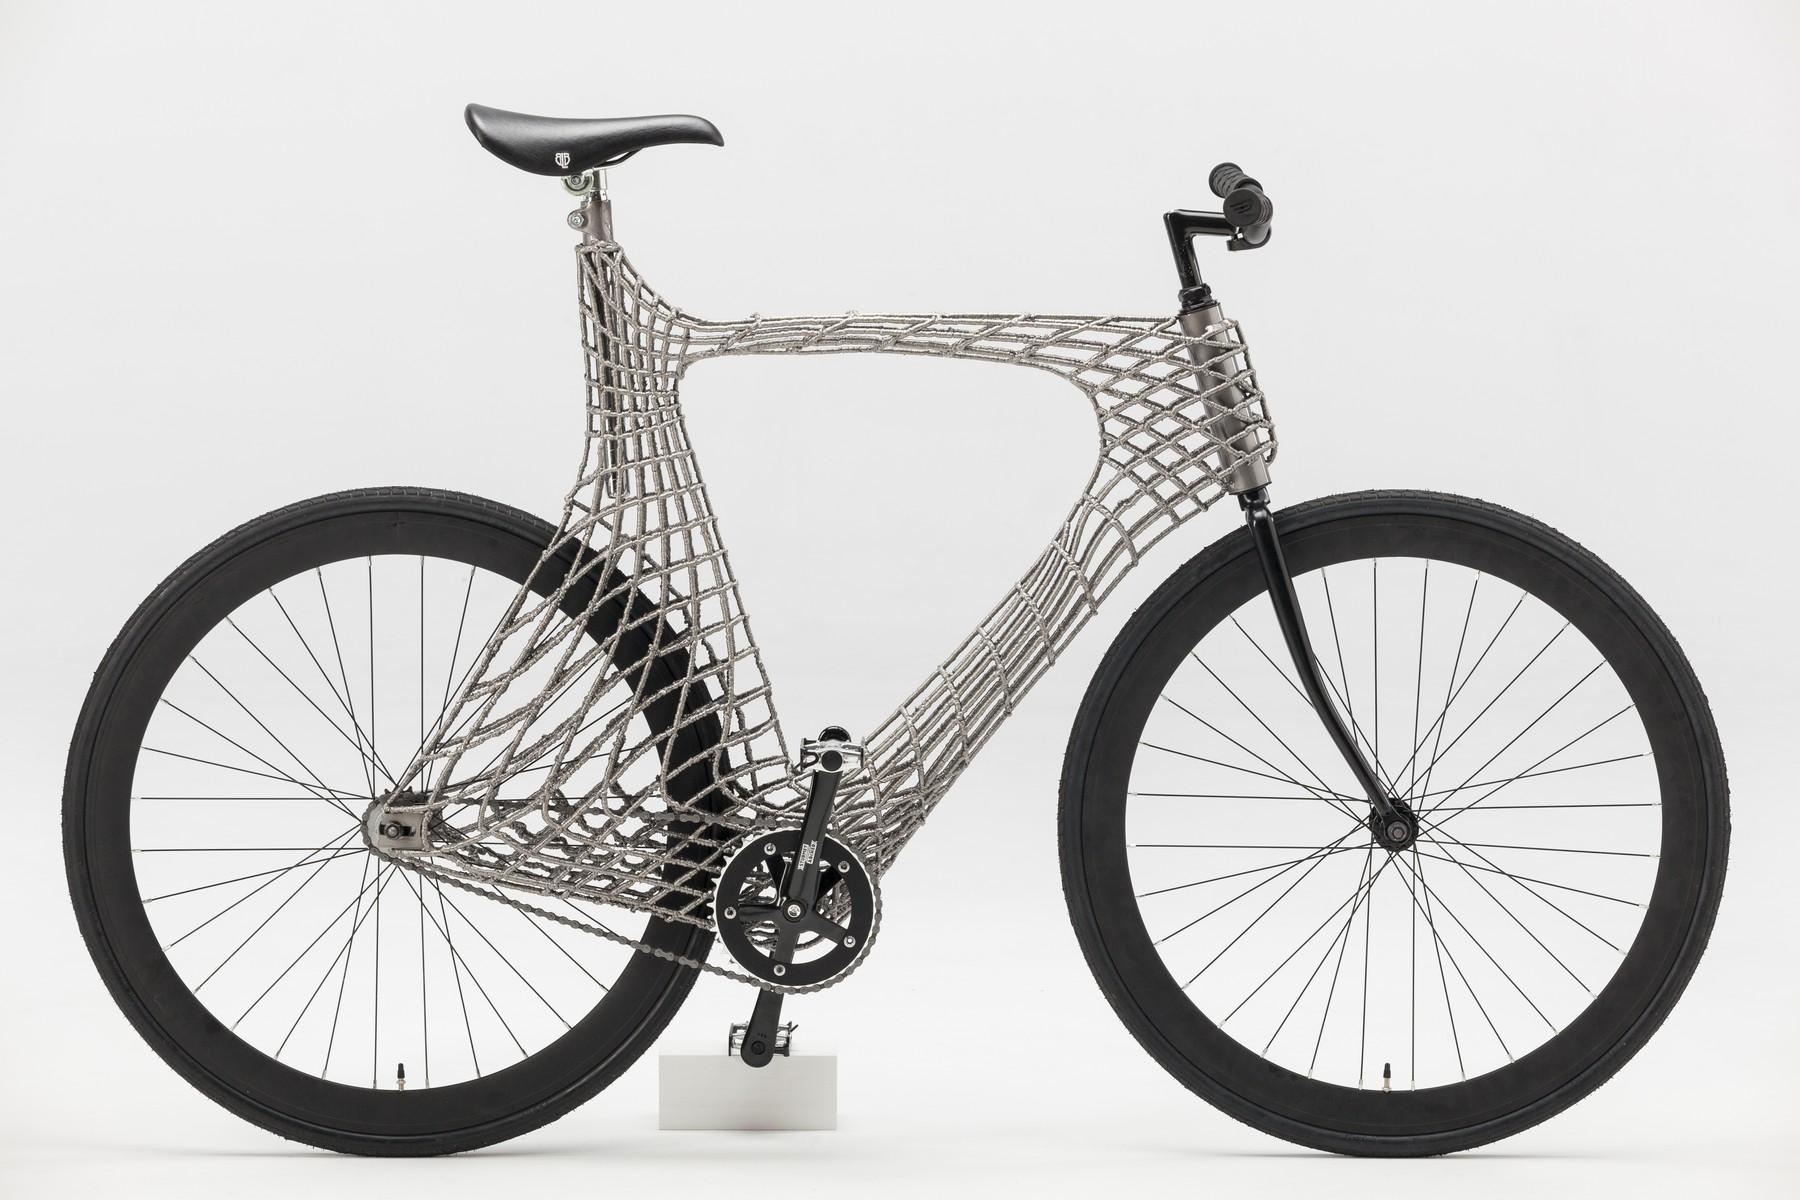 3d Друк велосипеда металом (3)